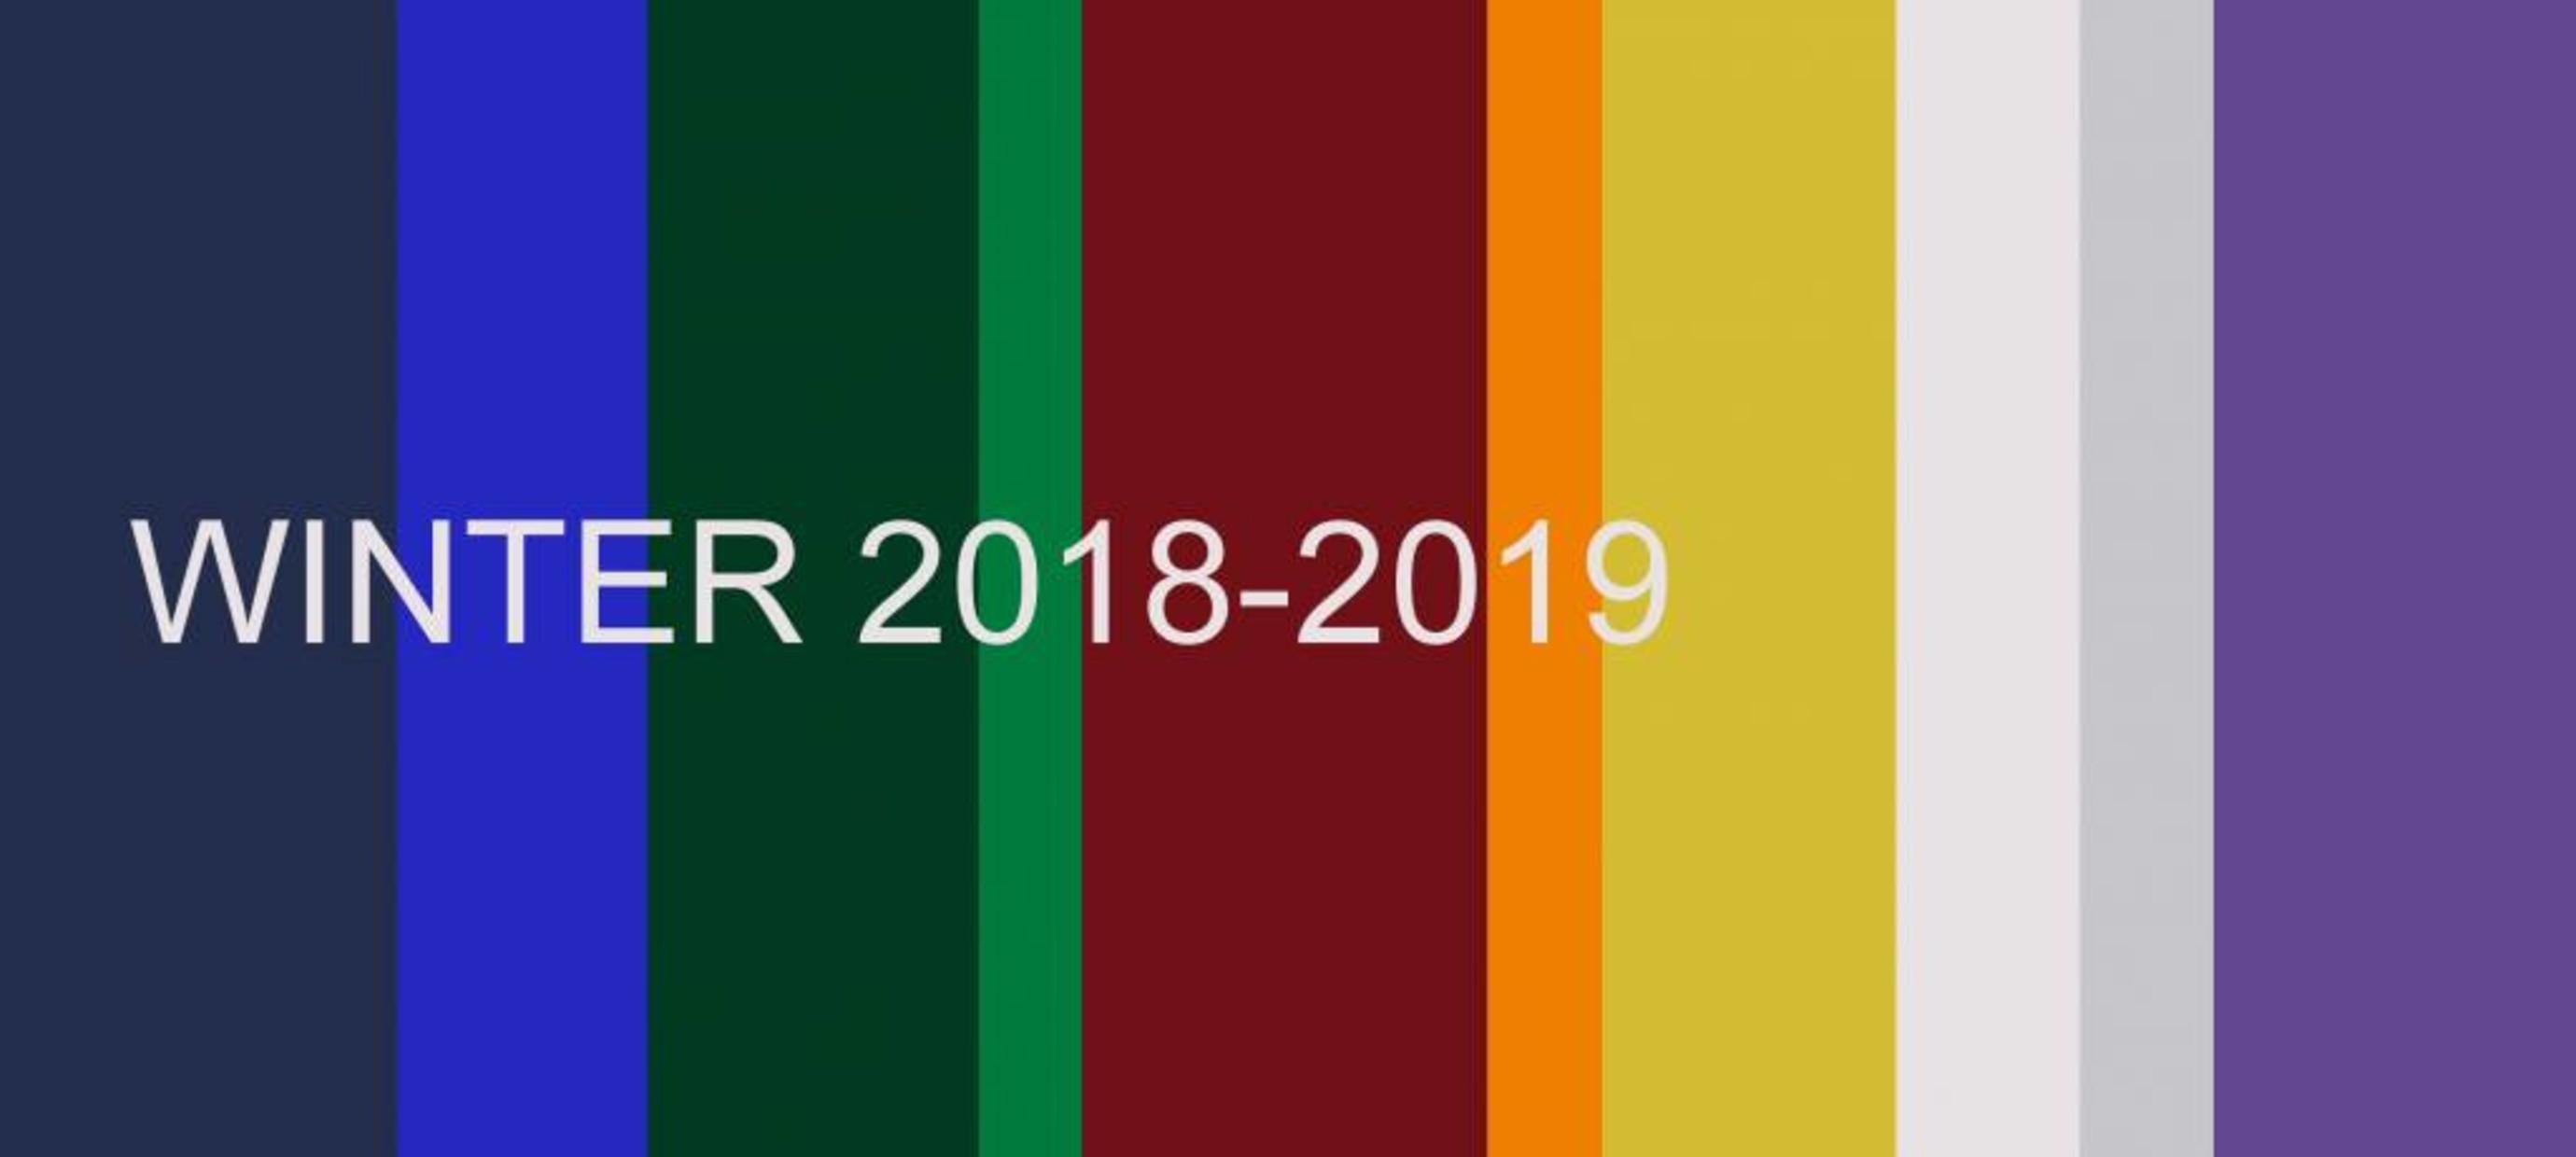 Top 10 Modefarben Winter 2018-2019